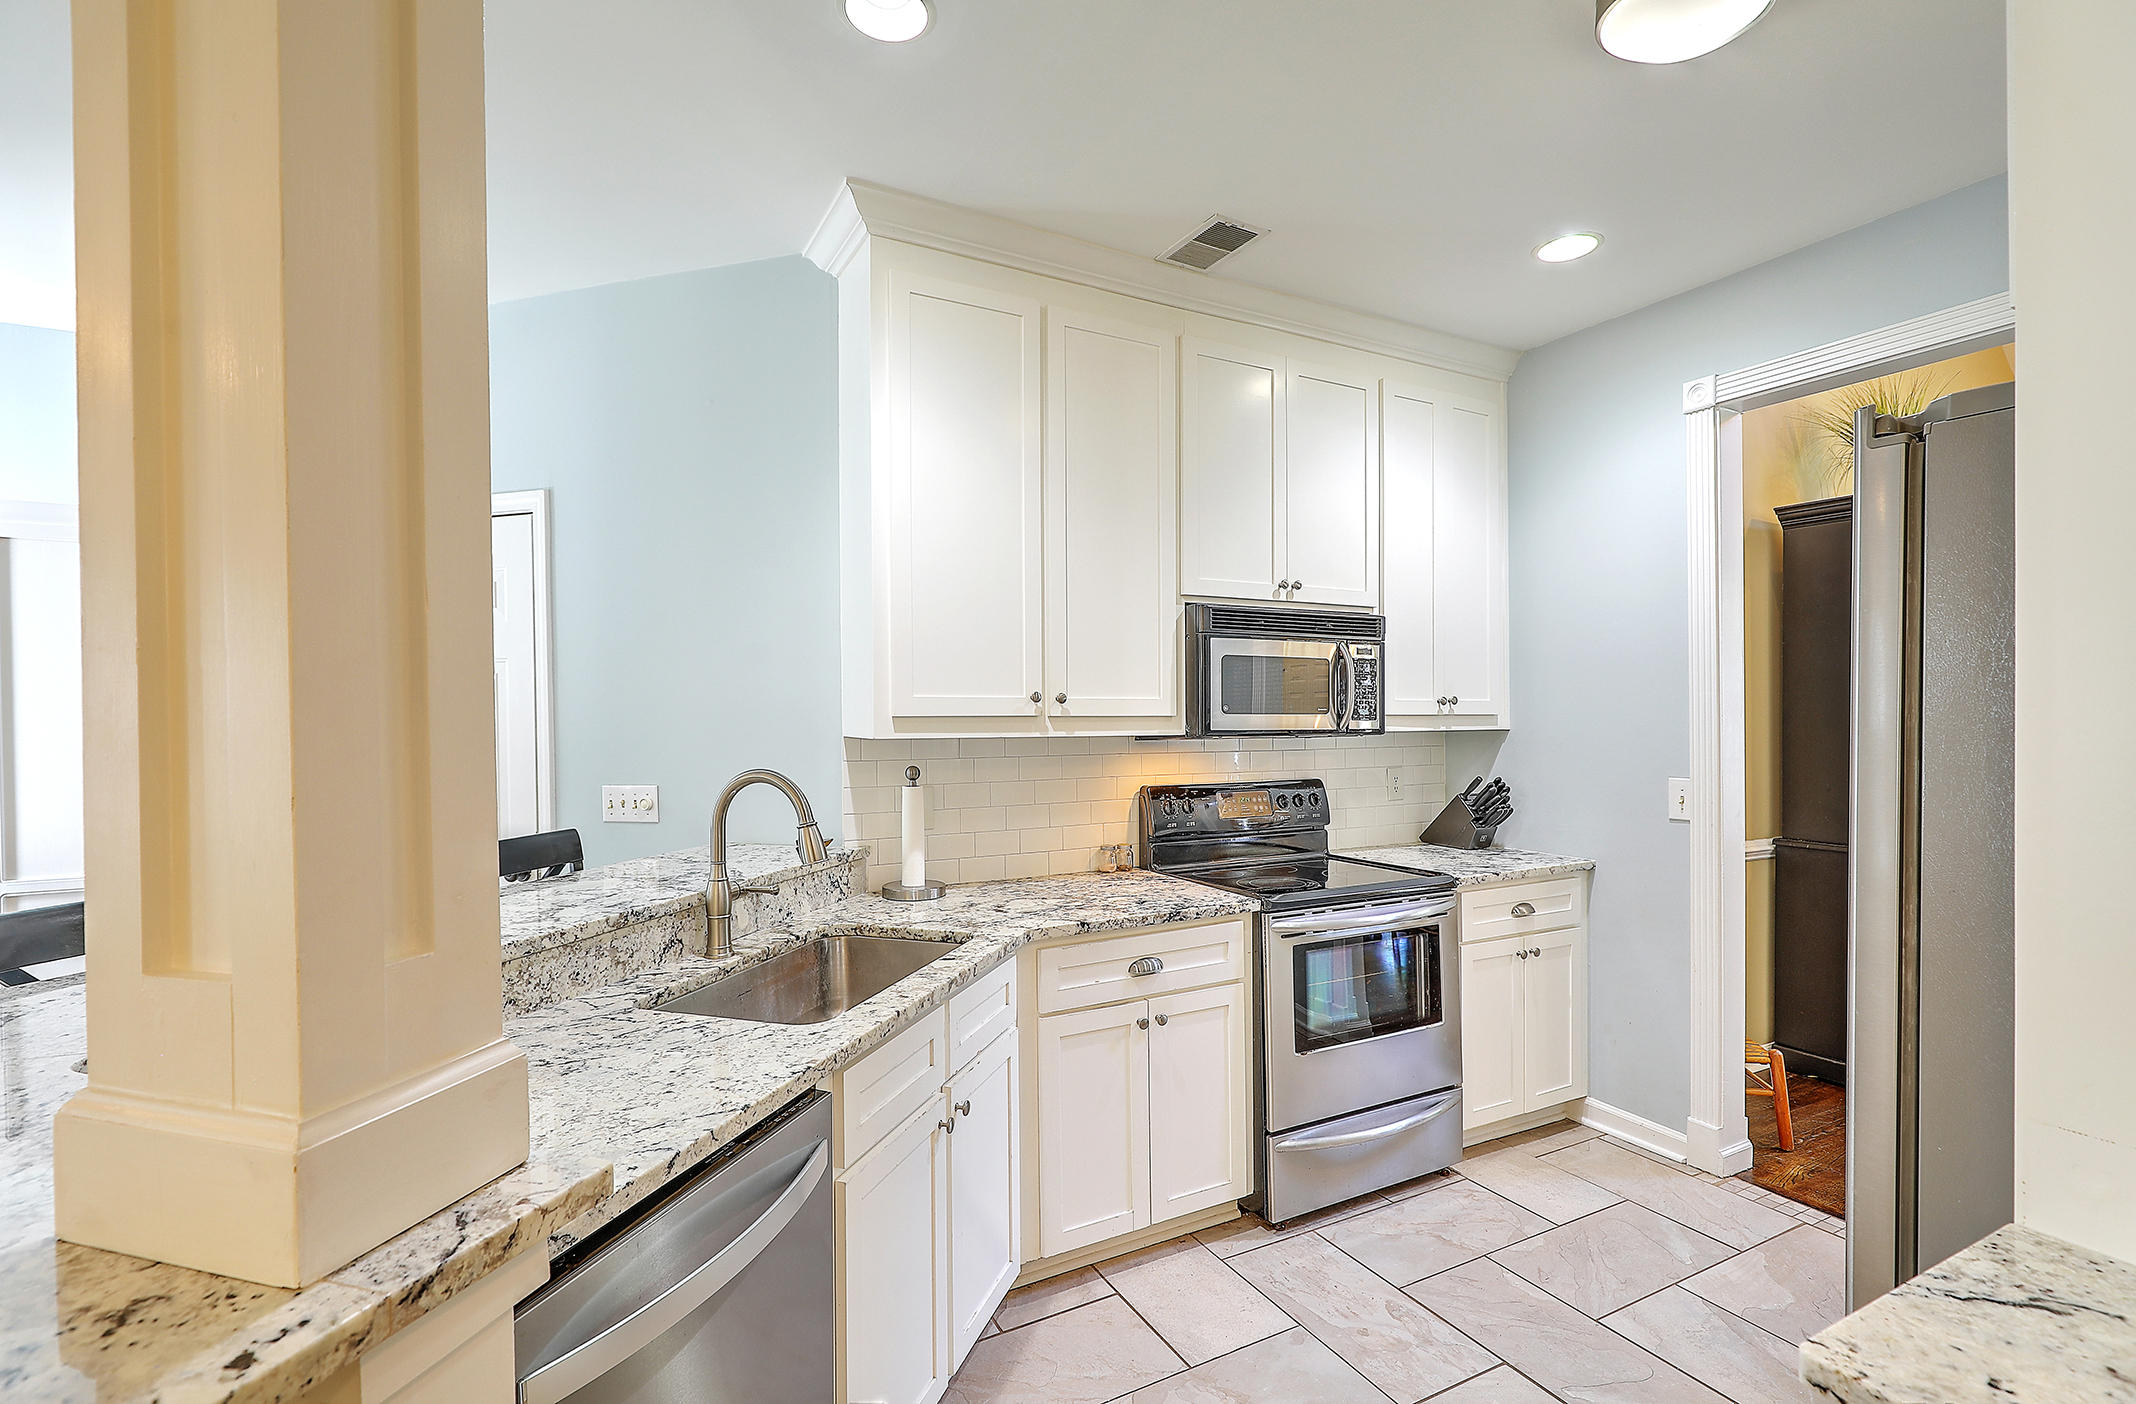 Brickyard Plantation Homes For Sale - 2720 Merwether, Mount Pleasant, SC - 12